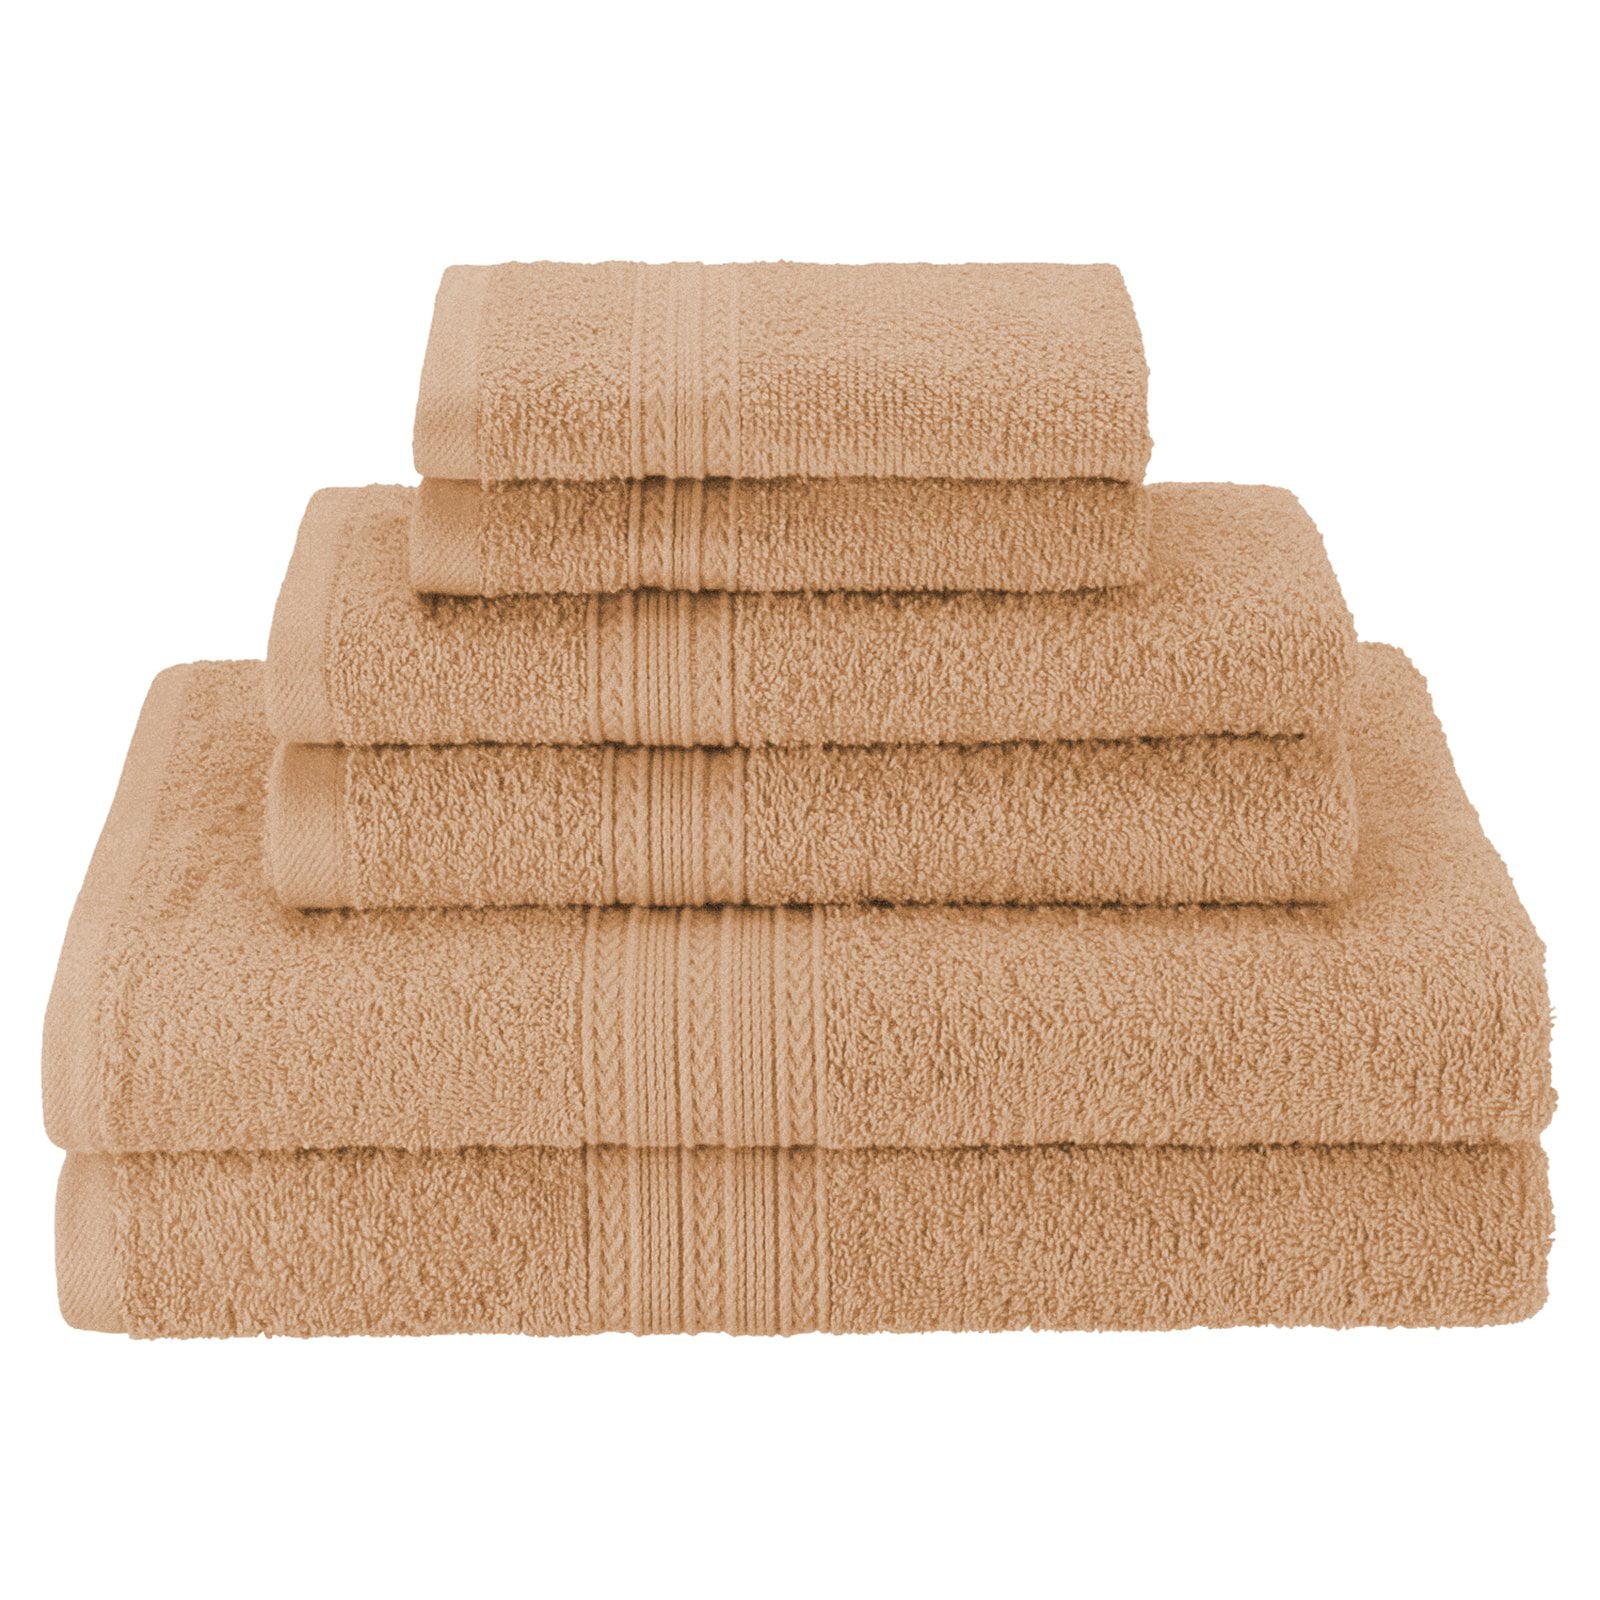 Superior Eco-Friendly 100% Ringspun Cotton 6Pc Towel Set